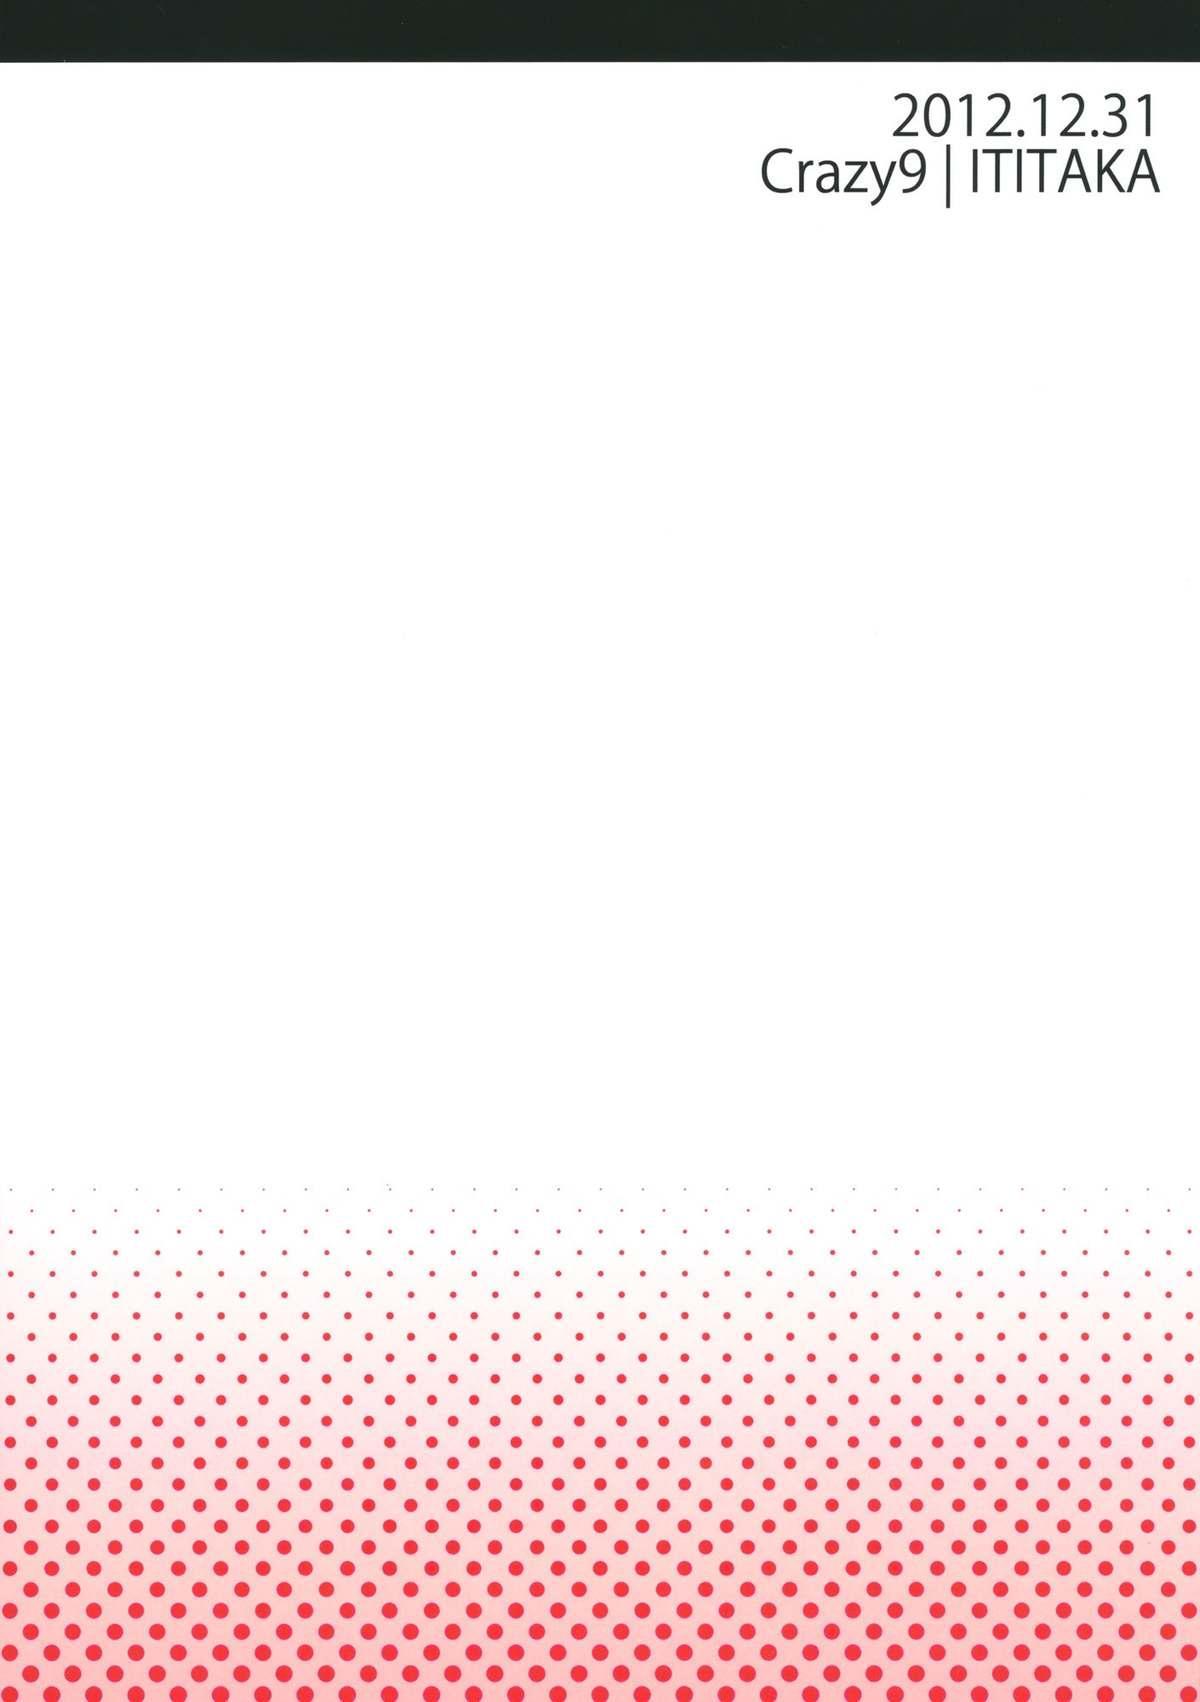 (C83) [Crazy9 (Ichitaka)] C9-03 Suguha to Lyfa to Oniichan no Shiawase Kazoku Keikaku   Plan For a Happy Family-Life with Suguha, Leafa, and Onii-chan (Sword Art Online) [English] {doujin-moe.us} 28